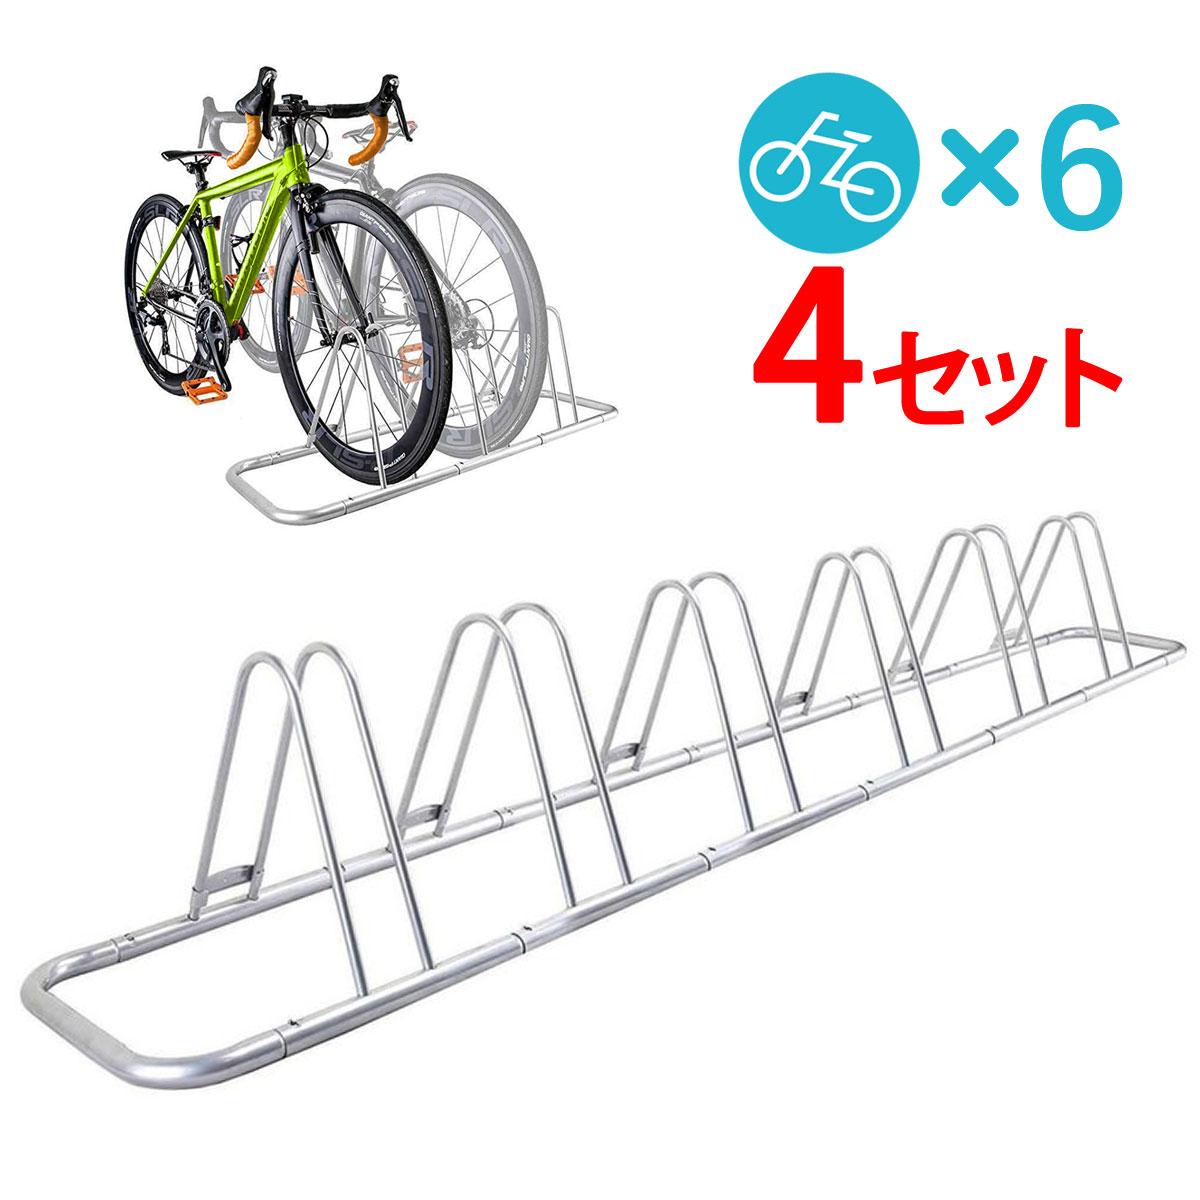 【B123】【4個セット】最大6台用自転車スタンド×4 NinoLite 直角 又は 斜め収納でスペース節約!自転車の多い方 会社用 店舗用にも大活躍! バイクスタンド サイクルパーキングラック 自転車ラック サイクルラック 駐輪ラック 斜め置きにもアレンジ可能 最大24台